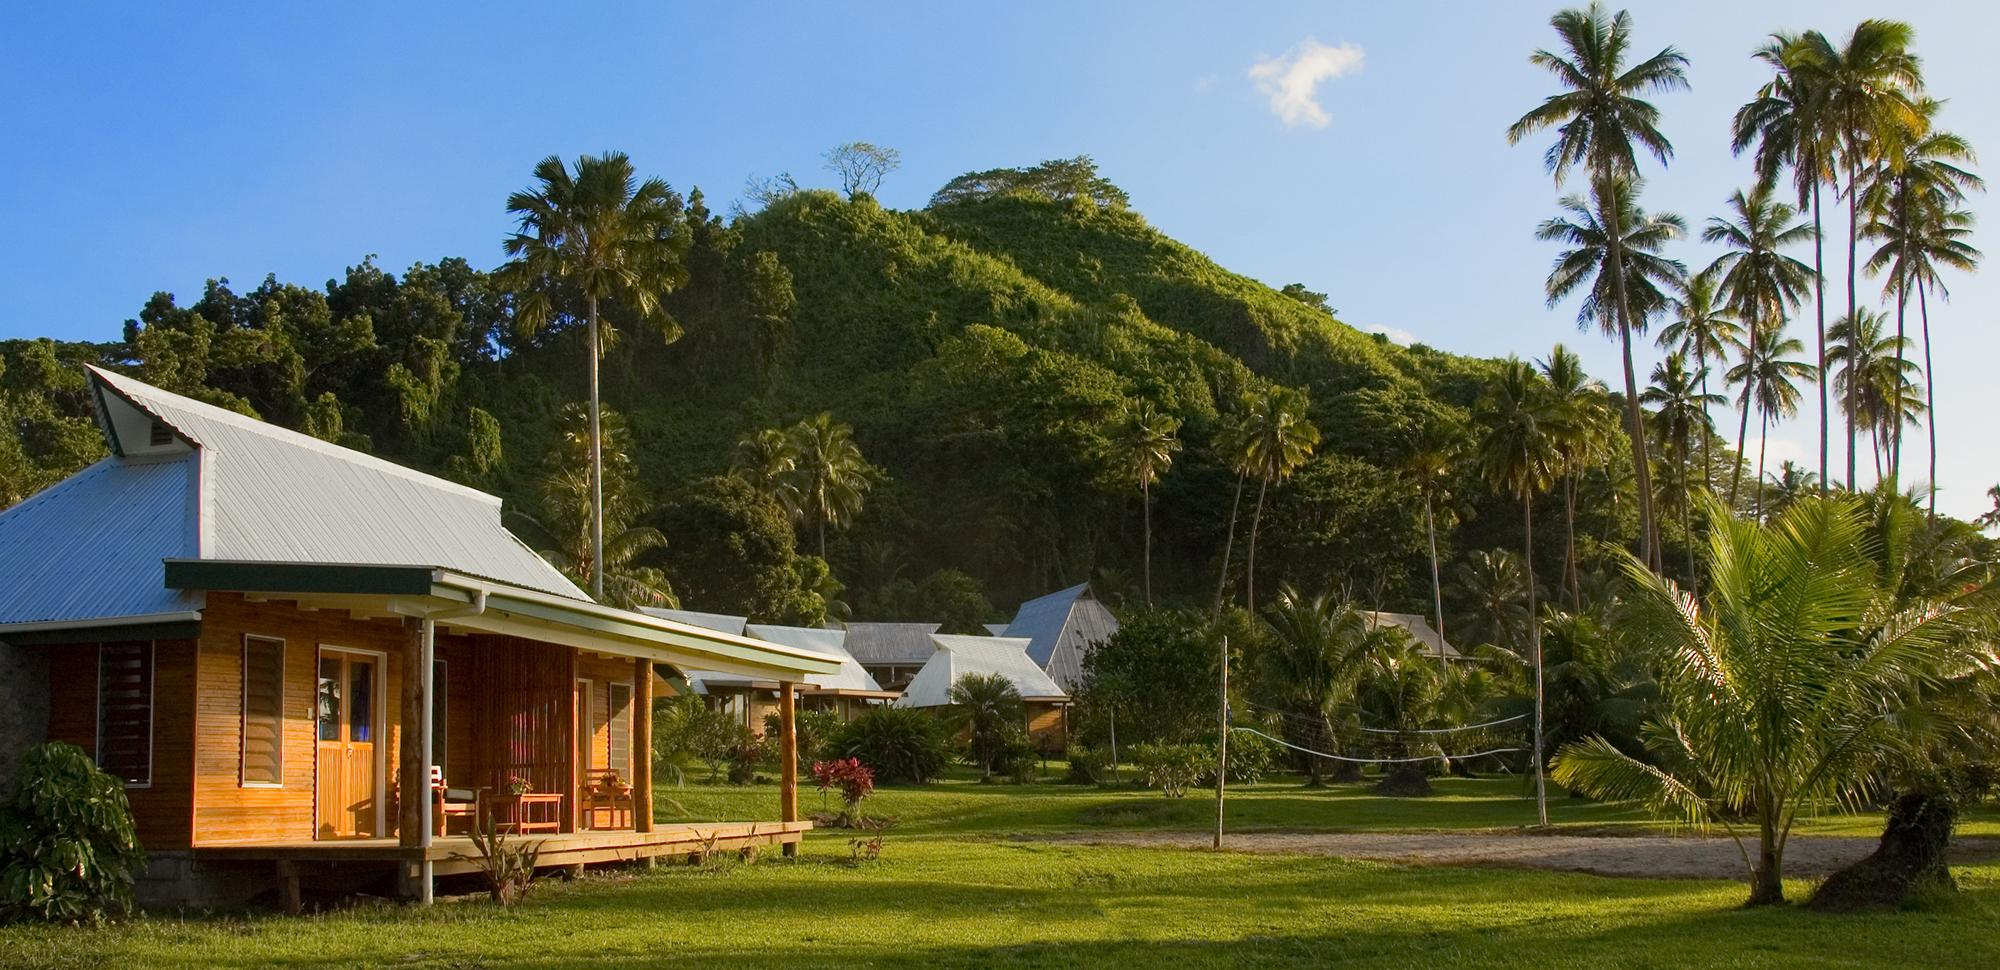 Beatuiful Daku Resort, SAVUSAVU Photo:http://www.divinginfiji.info/about/